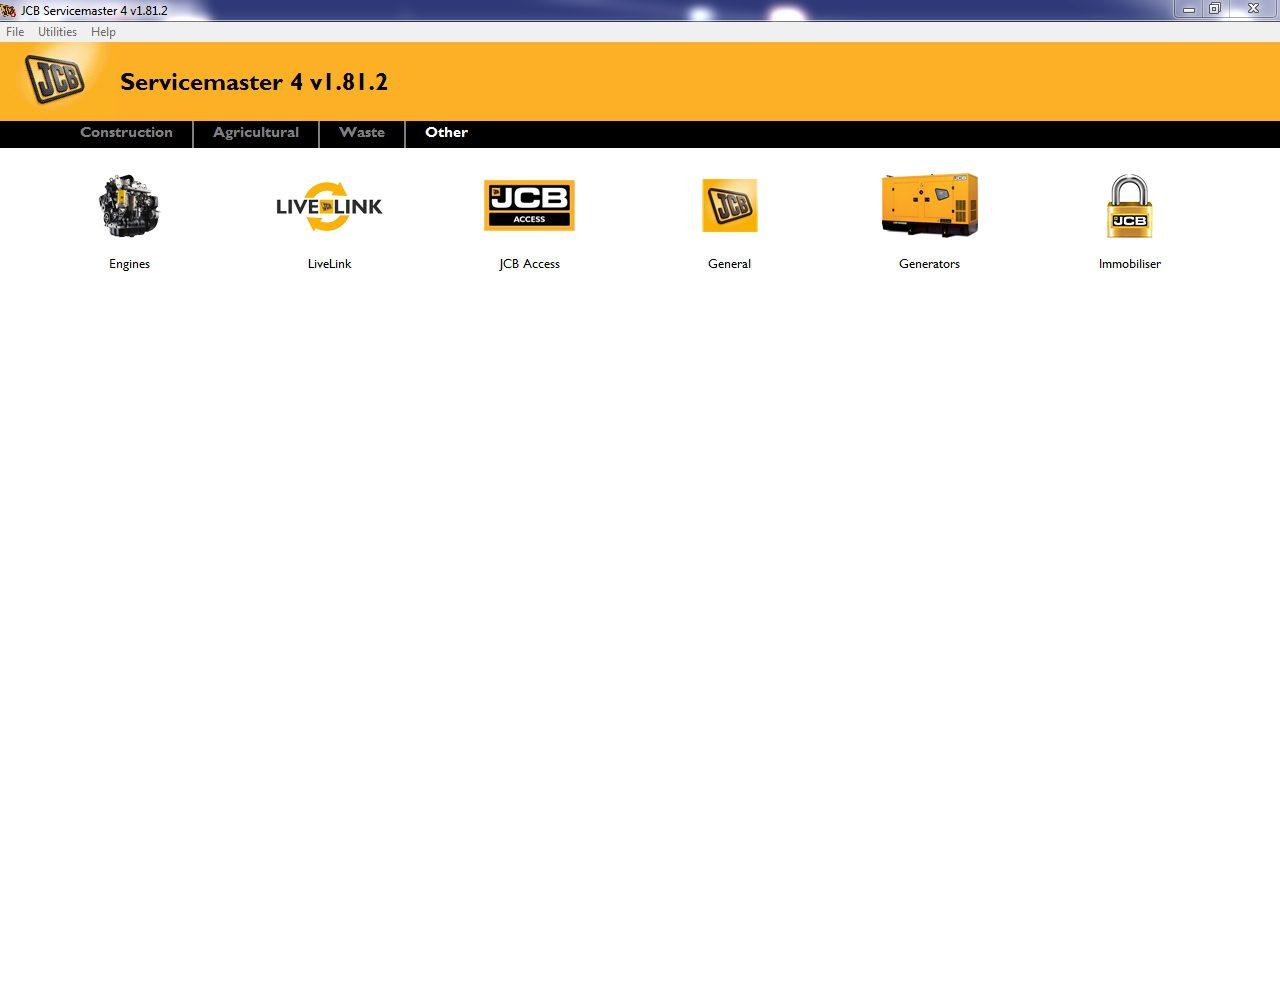 JCB_ServiceMaster_4_v1812_05201904